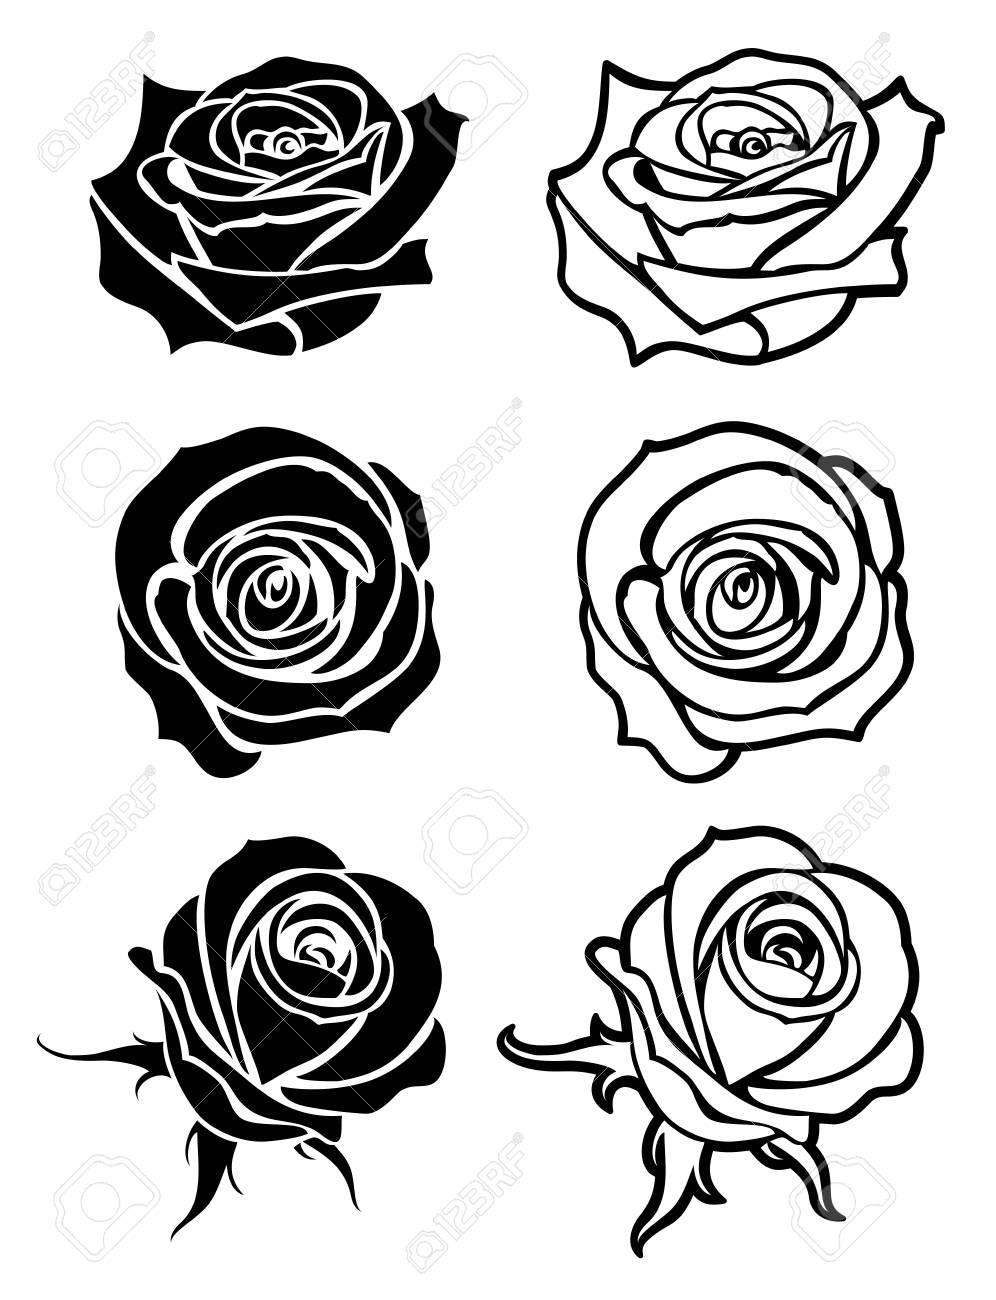 Close Up Rose Vector Tattoo Royalty Free Cliparts Vectors And